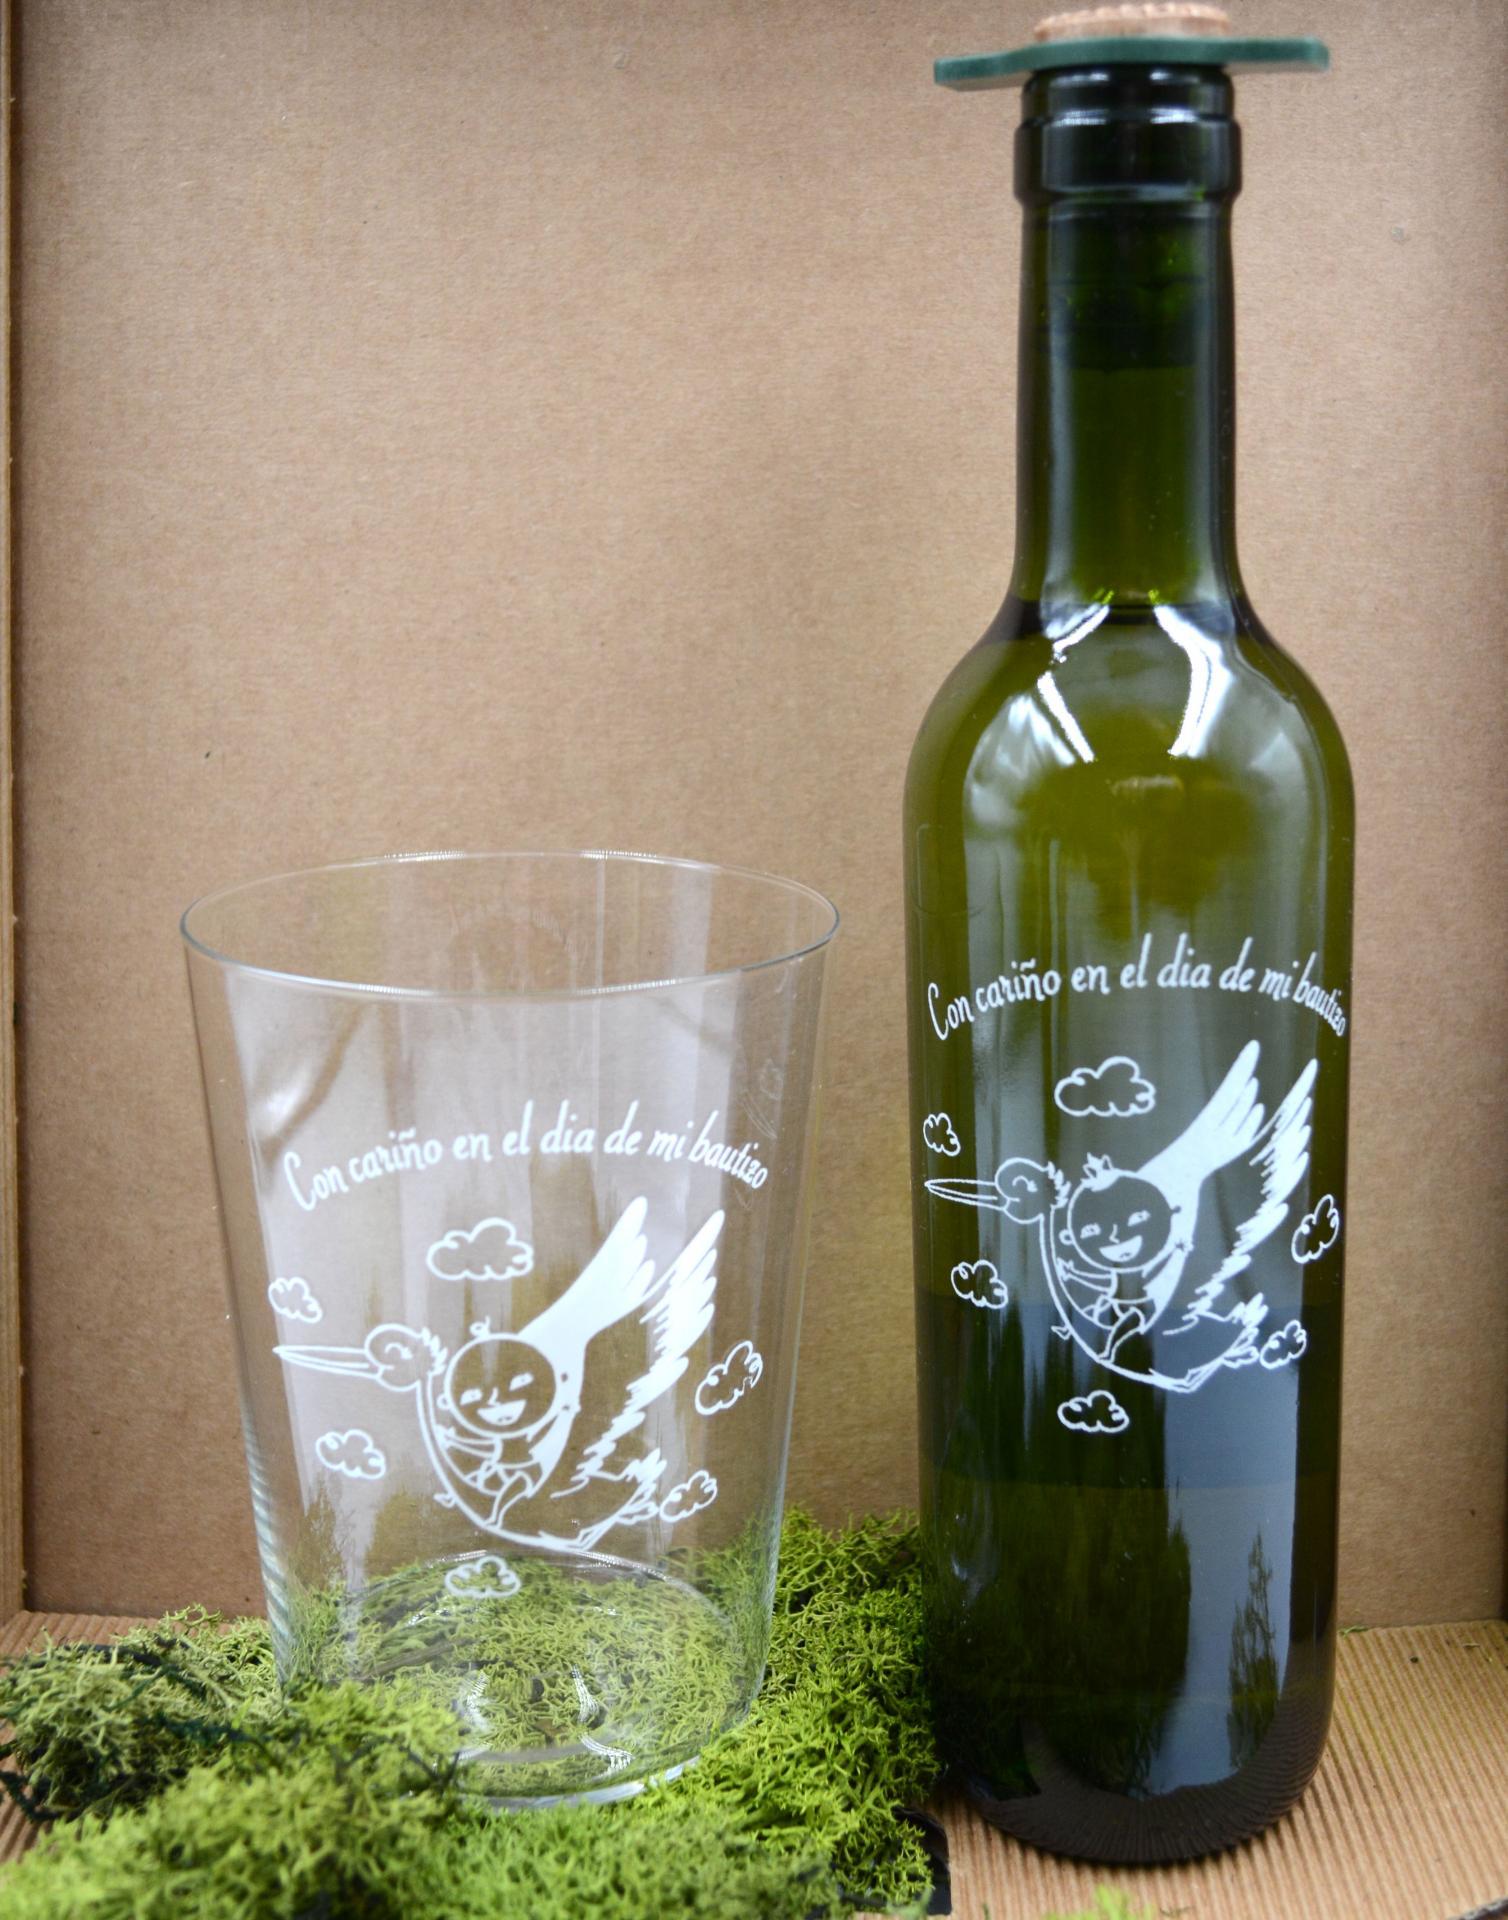 Vaso de Sidra Bautizo con Botella de Sidra Natural Llagarín